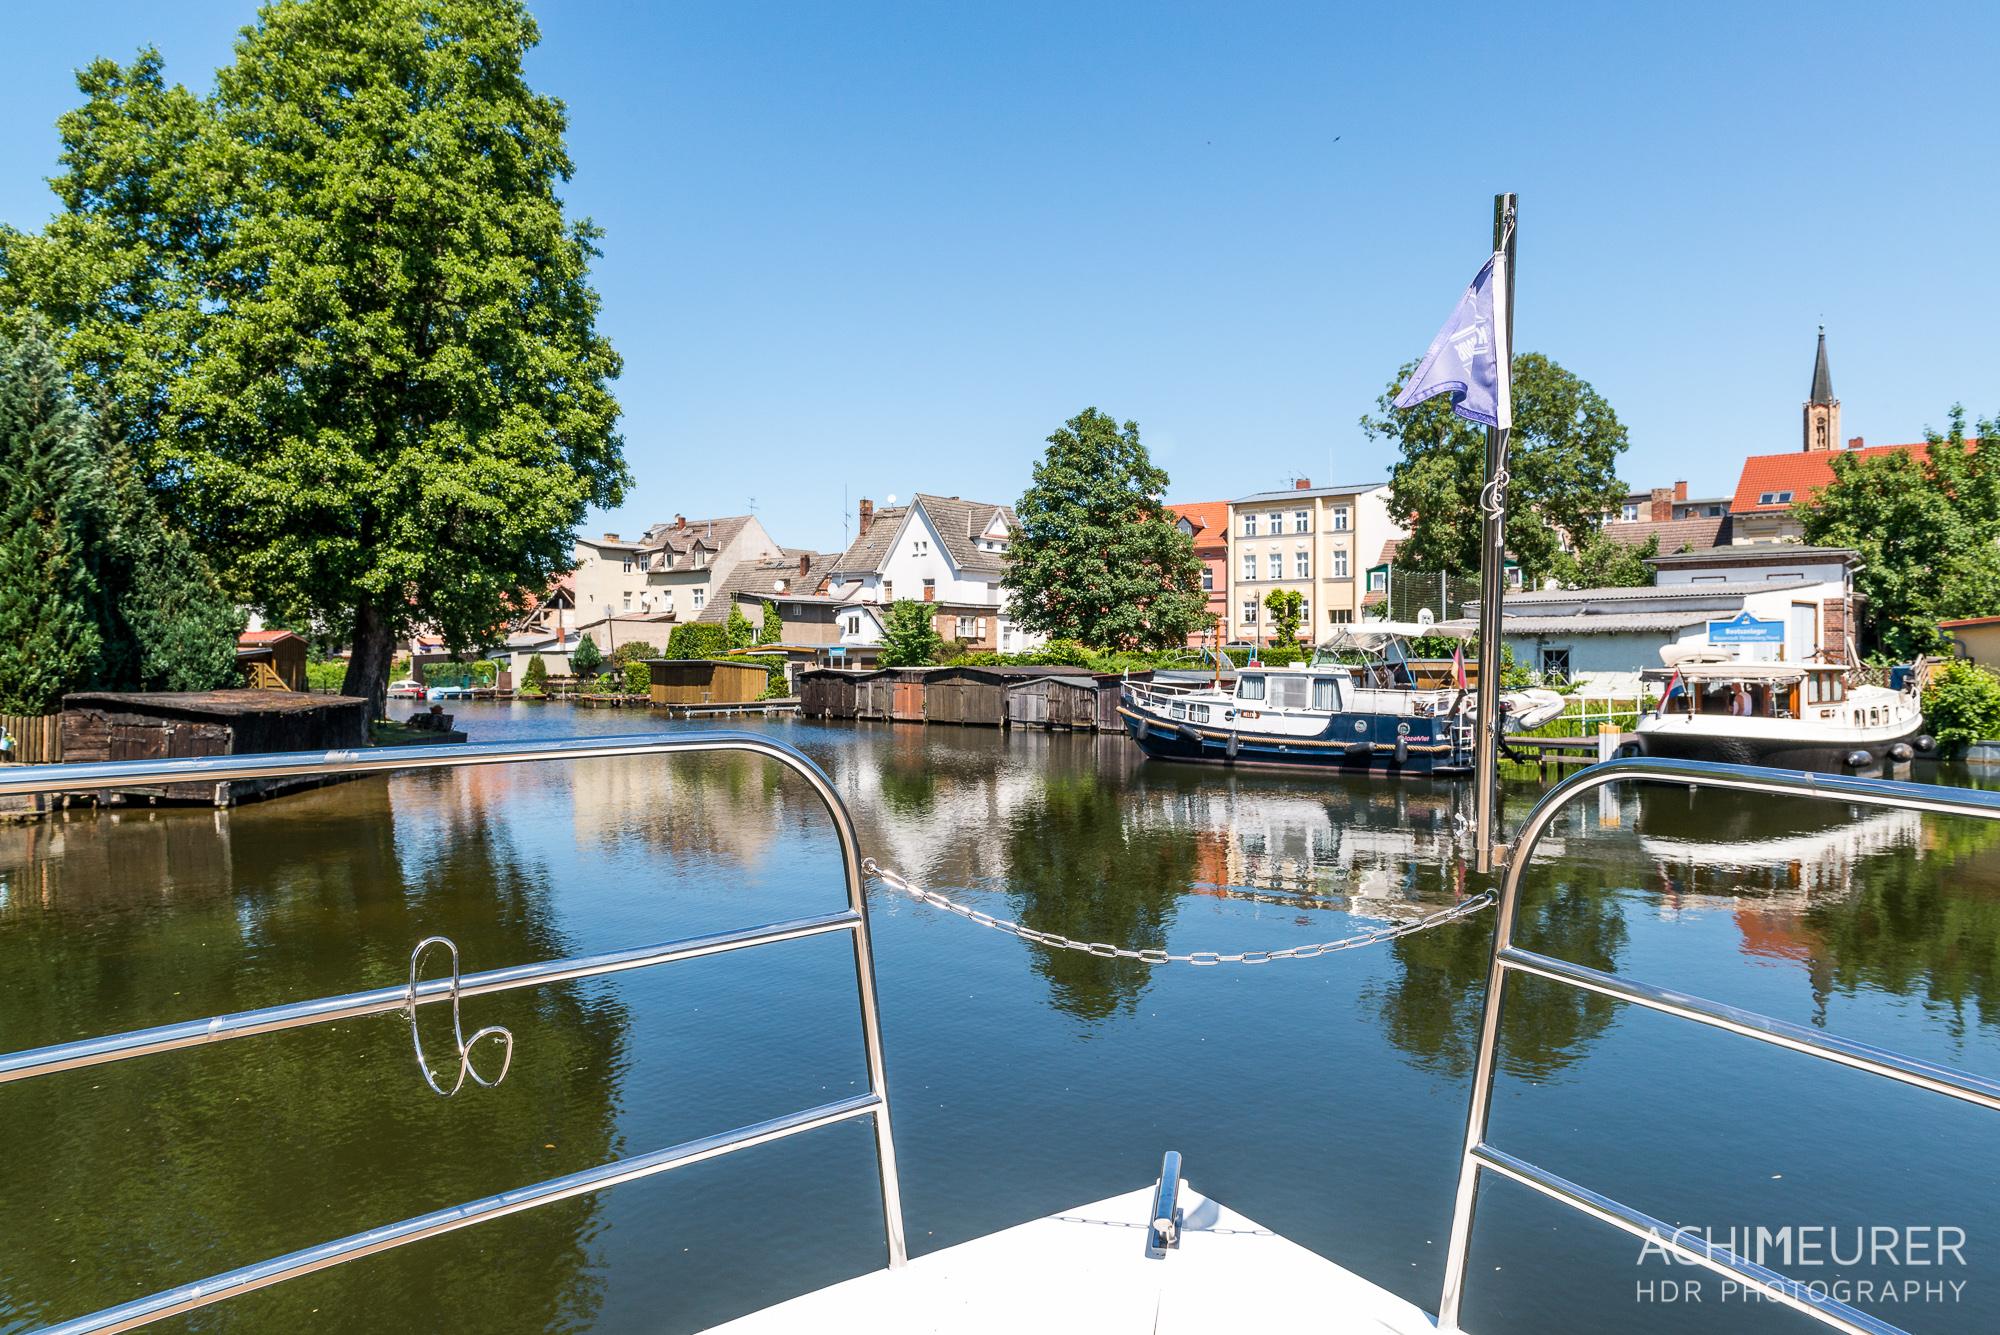 Hausboot-Kuhnle-Mueritz-Mecklenburg-Vorpommern-See_3158